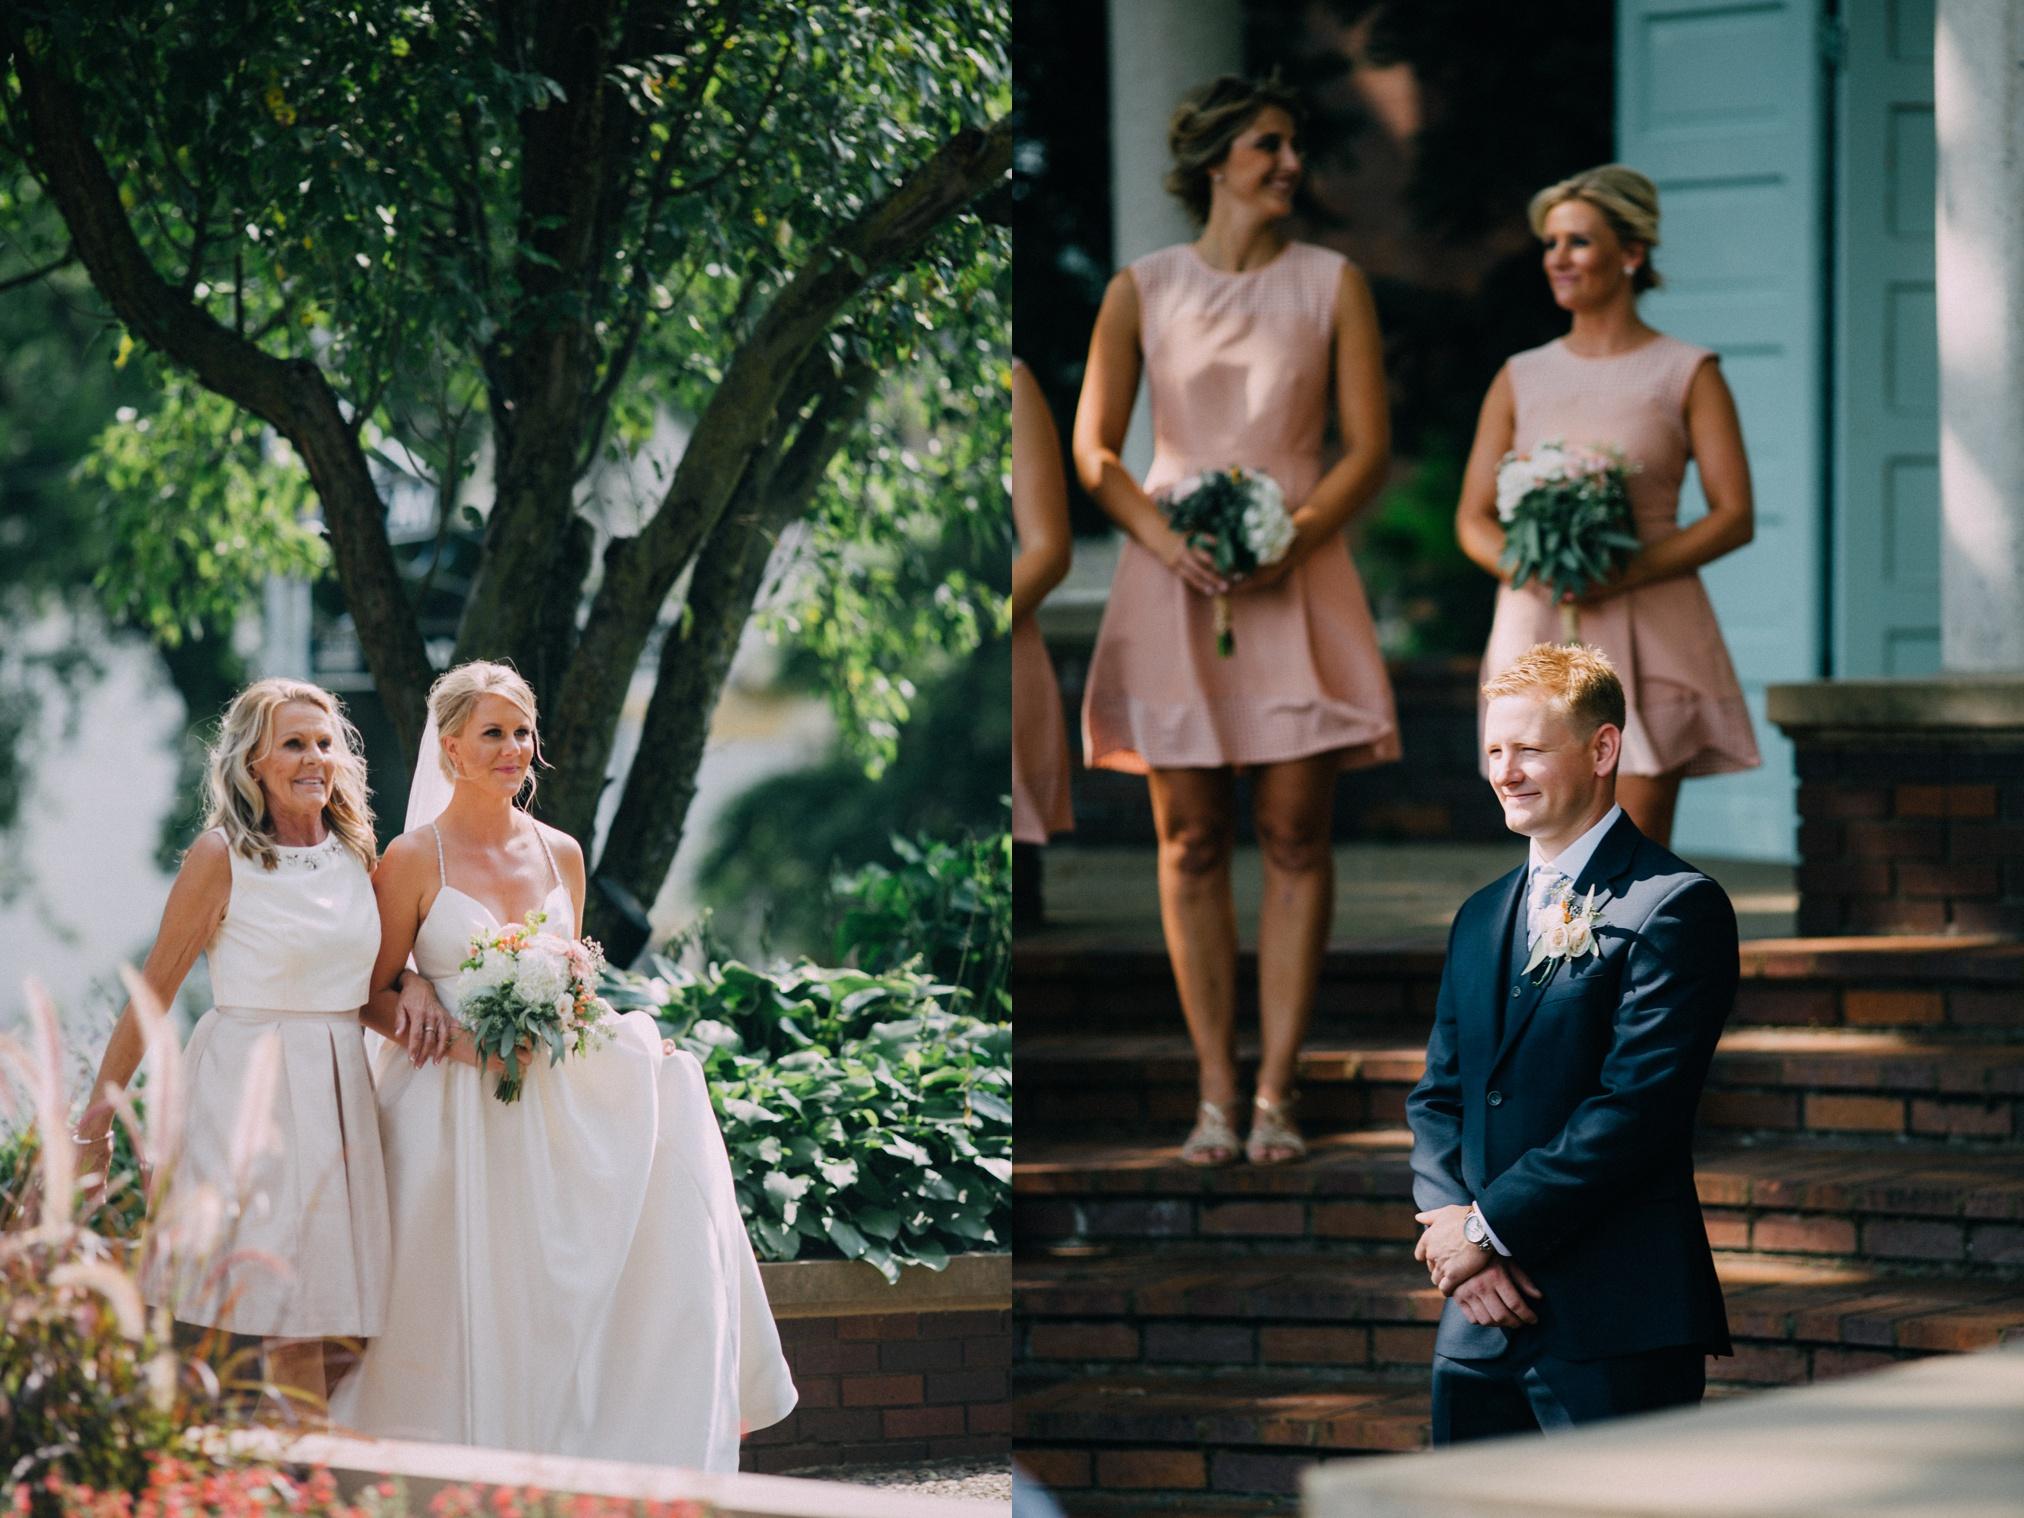 brenna+michael_wedding-376.jpg